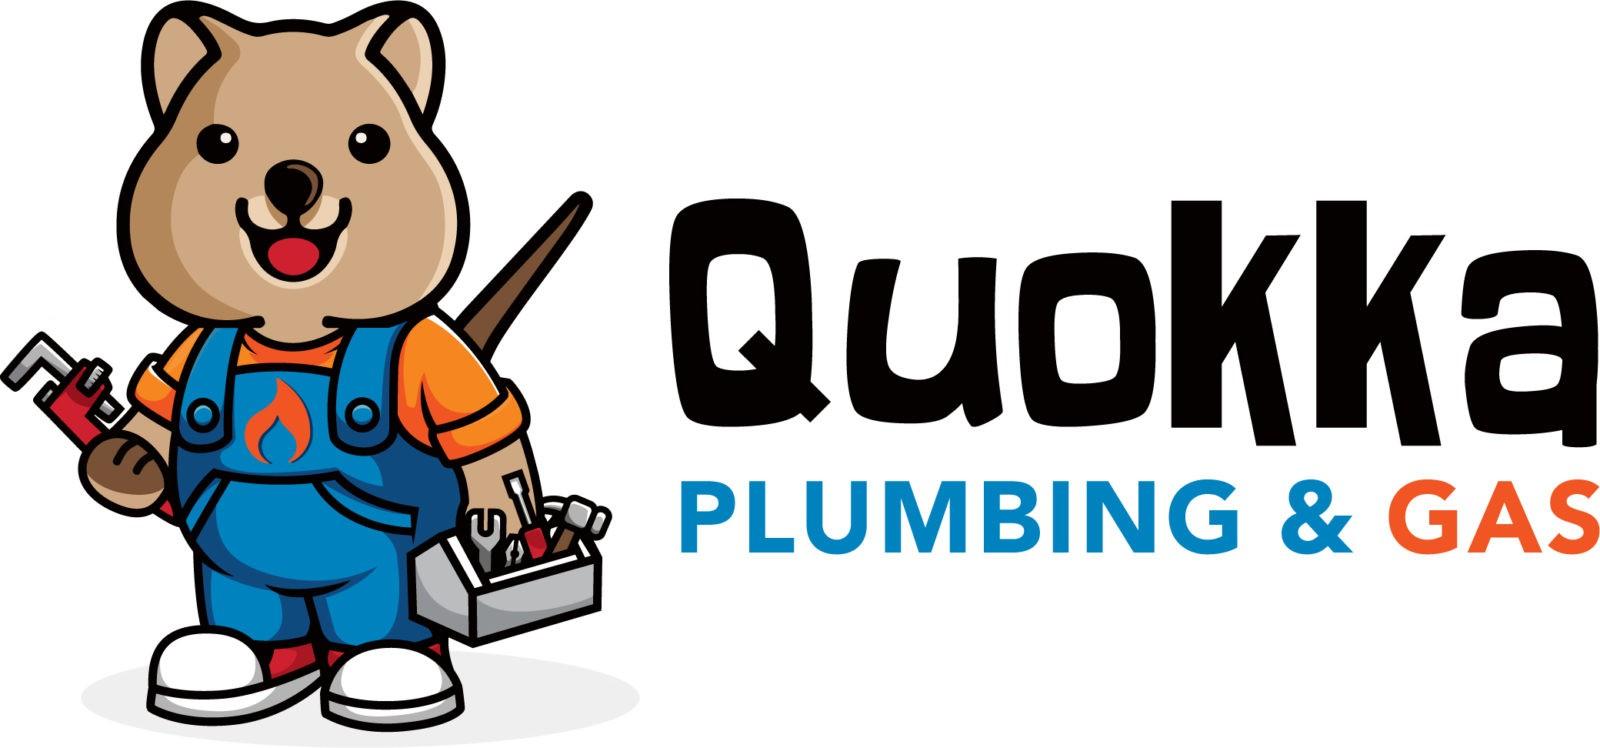 Quokka Plumbing & Gas